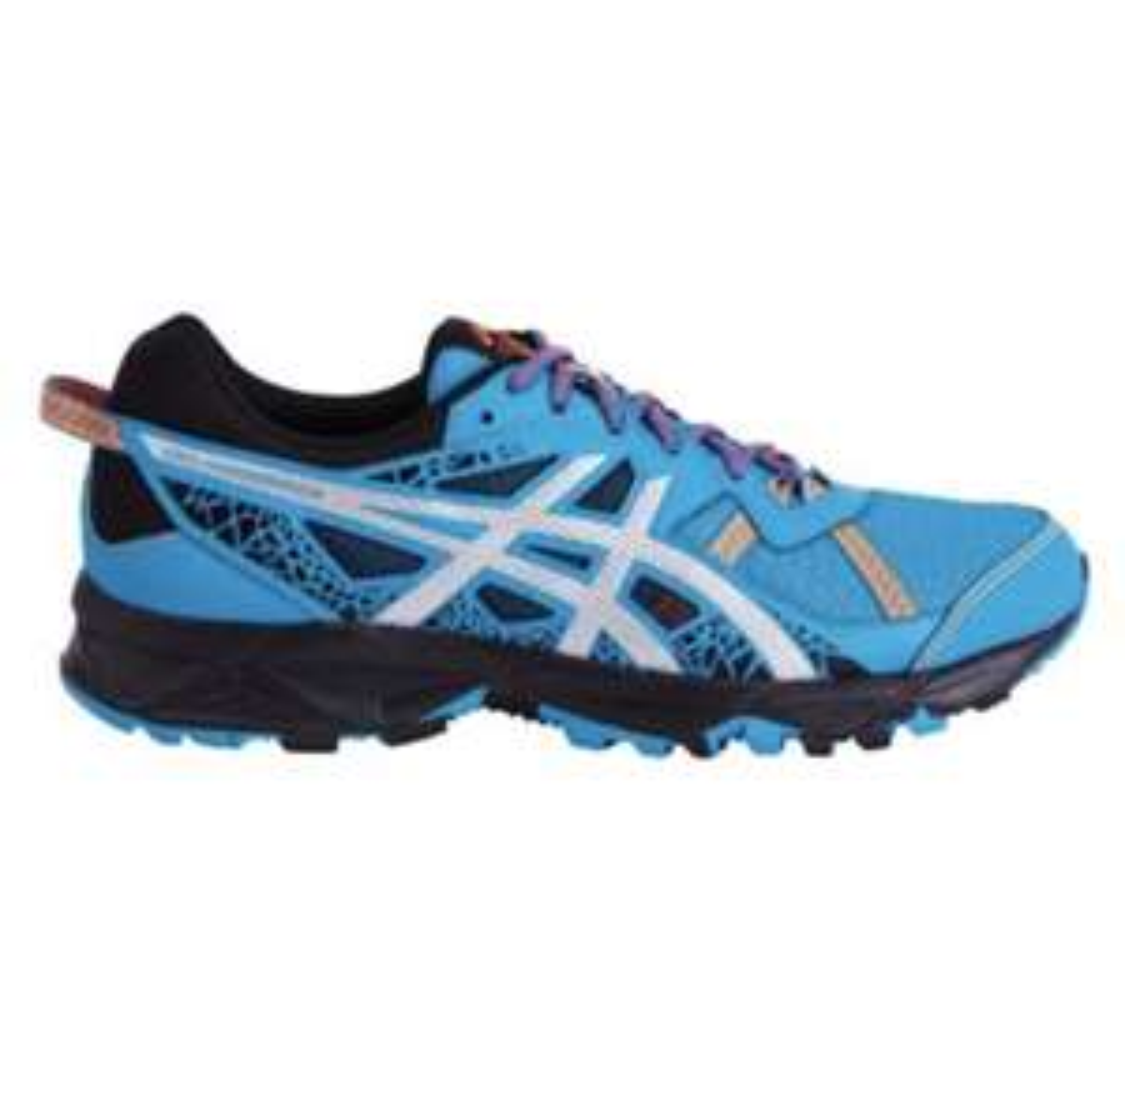 Tailles Gel 3plusieurs Kanaku Trail Chaussures De Mixtes Asics lcK1JTF